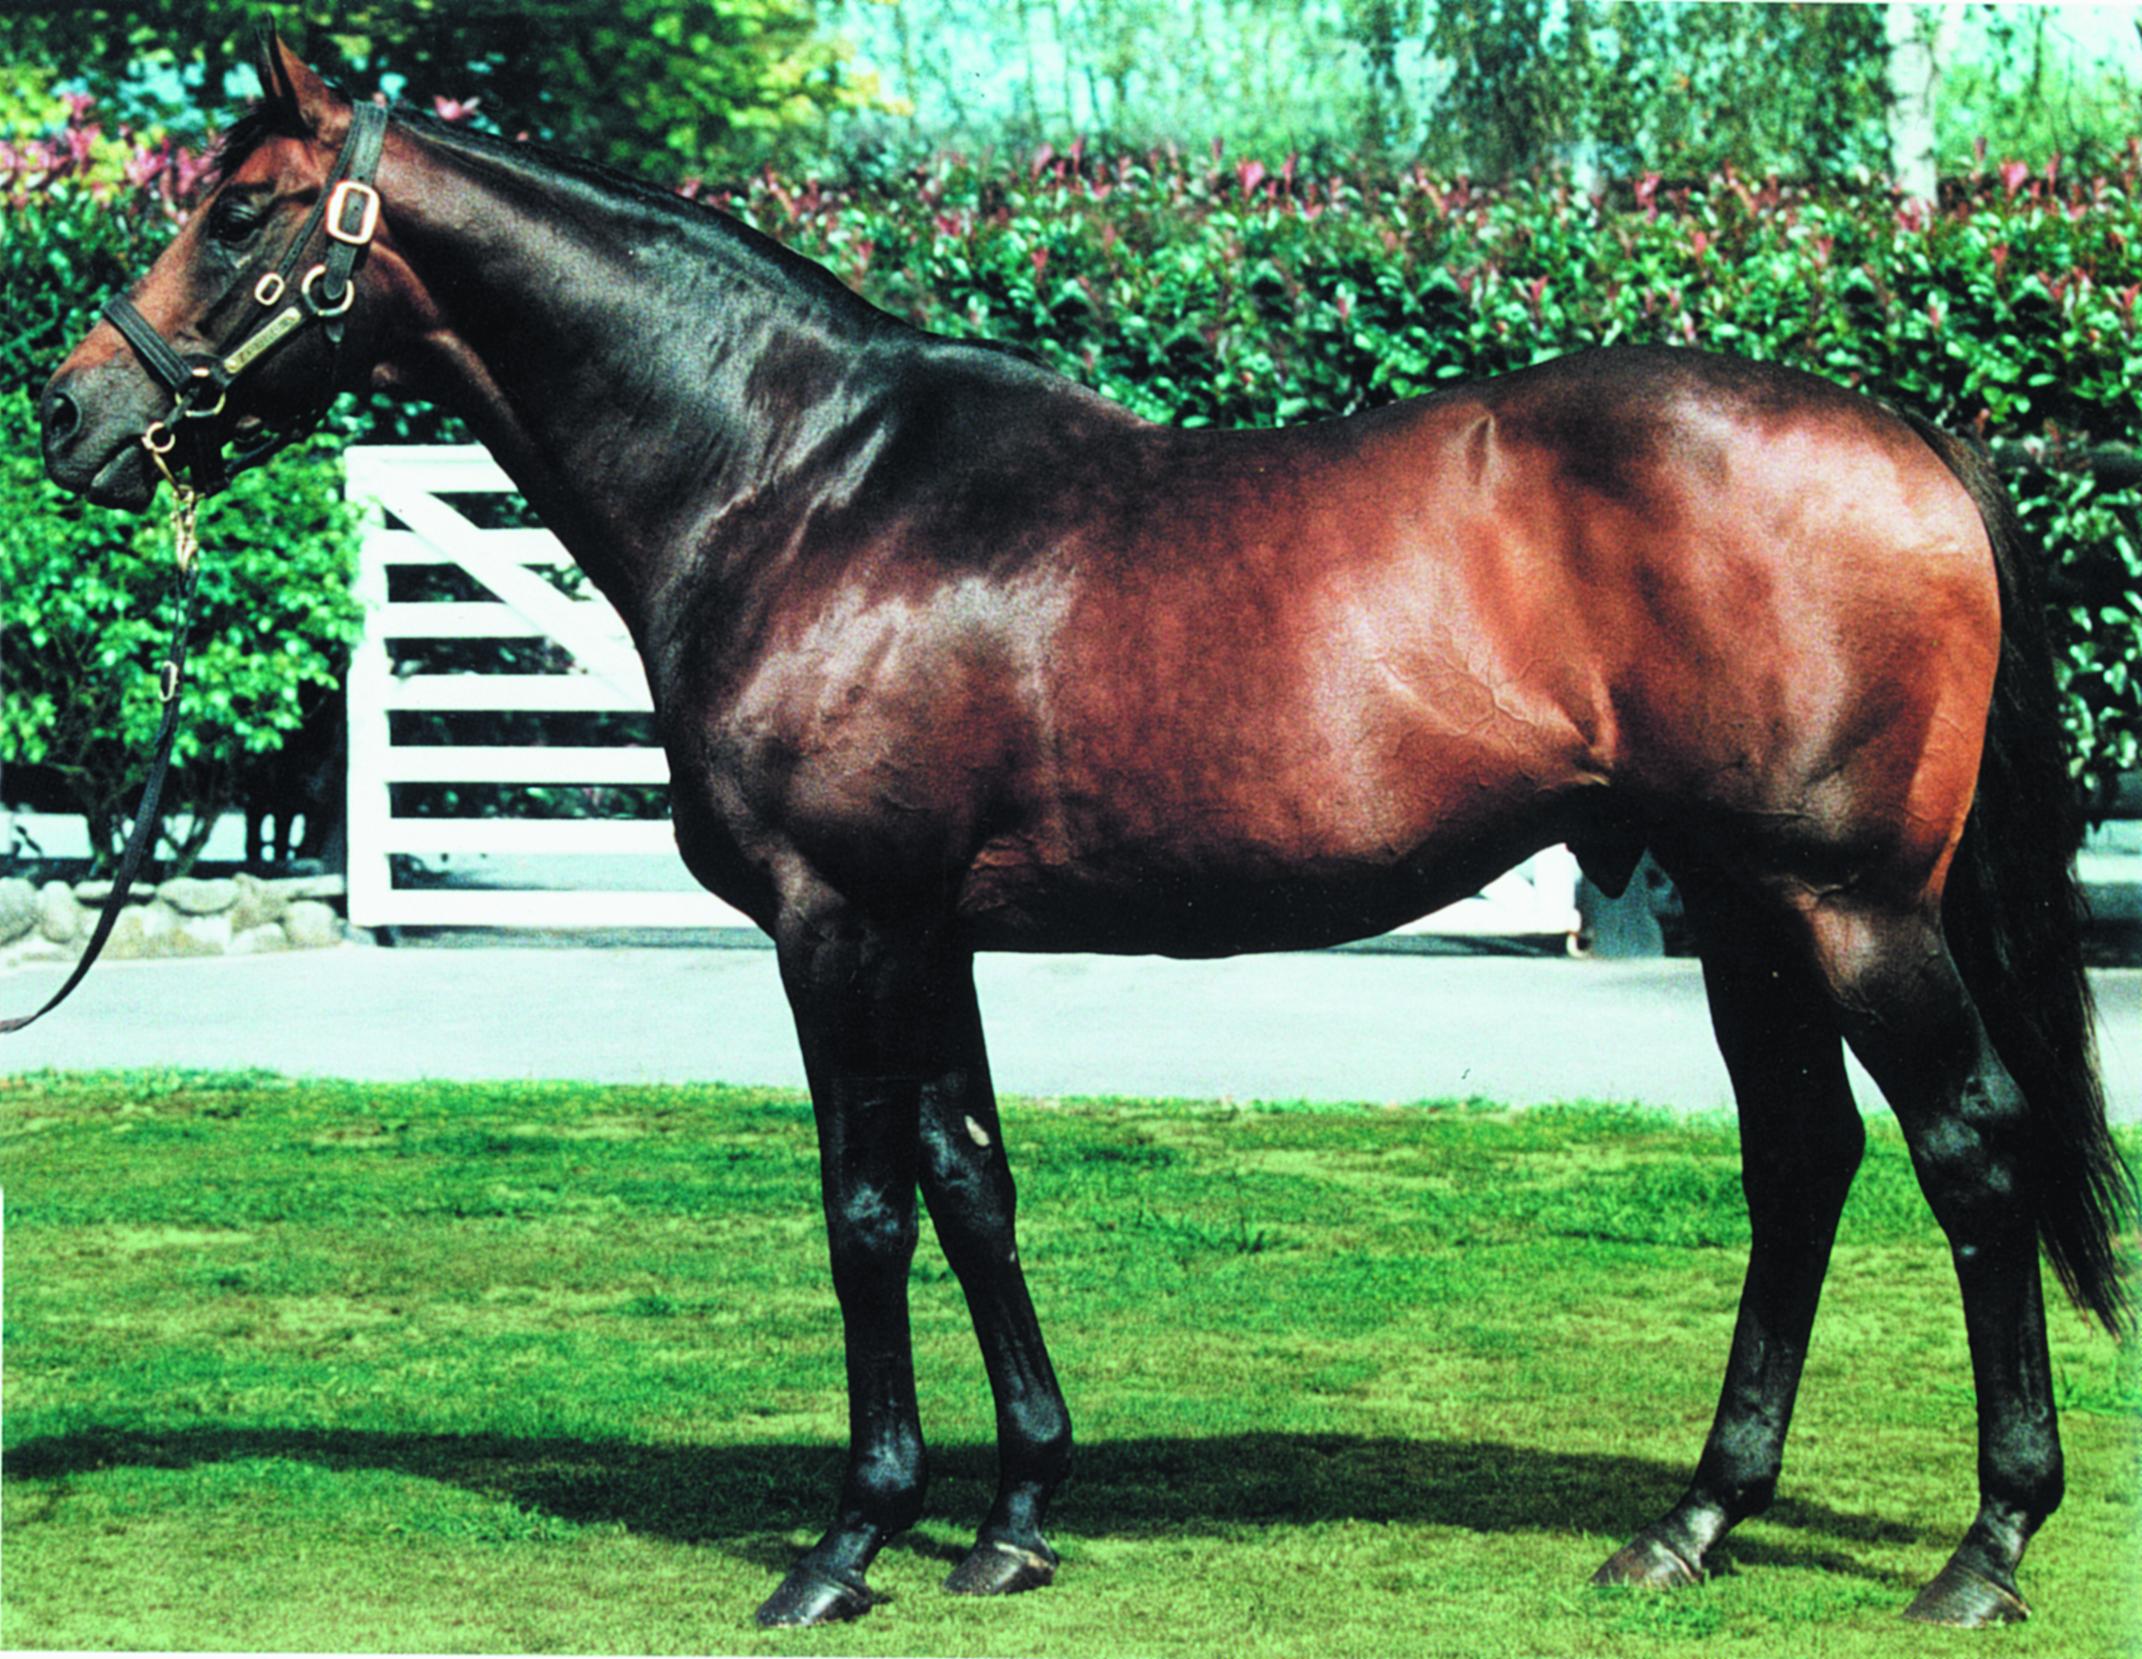 https://www.stallions.com.au/wp-content/uploads/2020/08/Zabeel.jpg